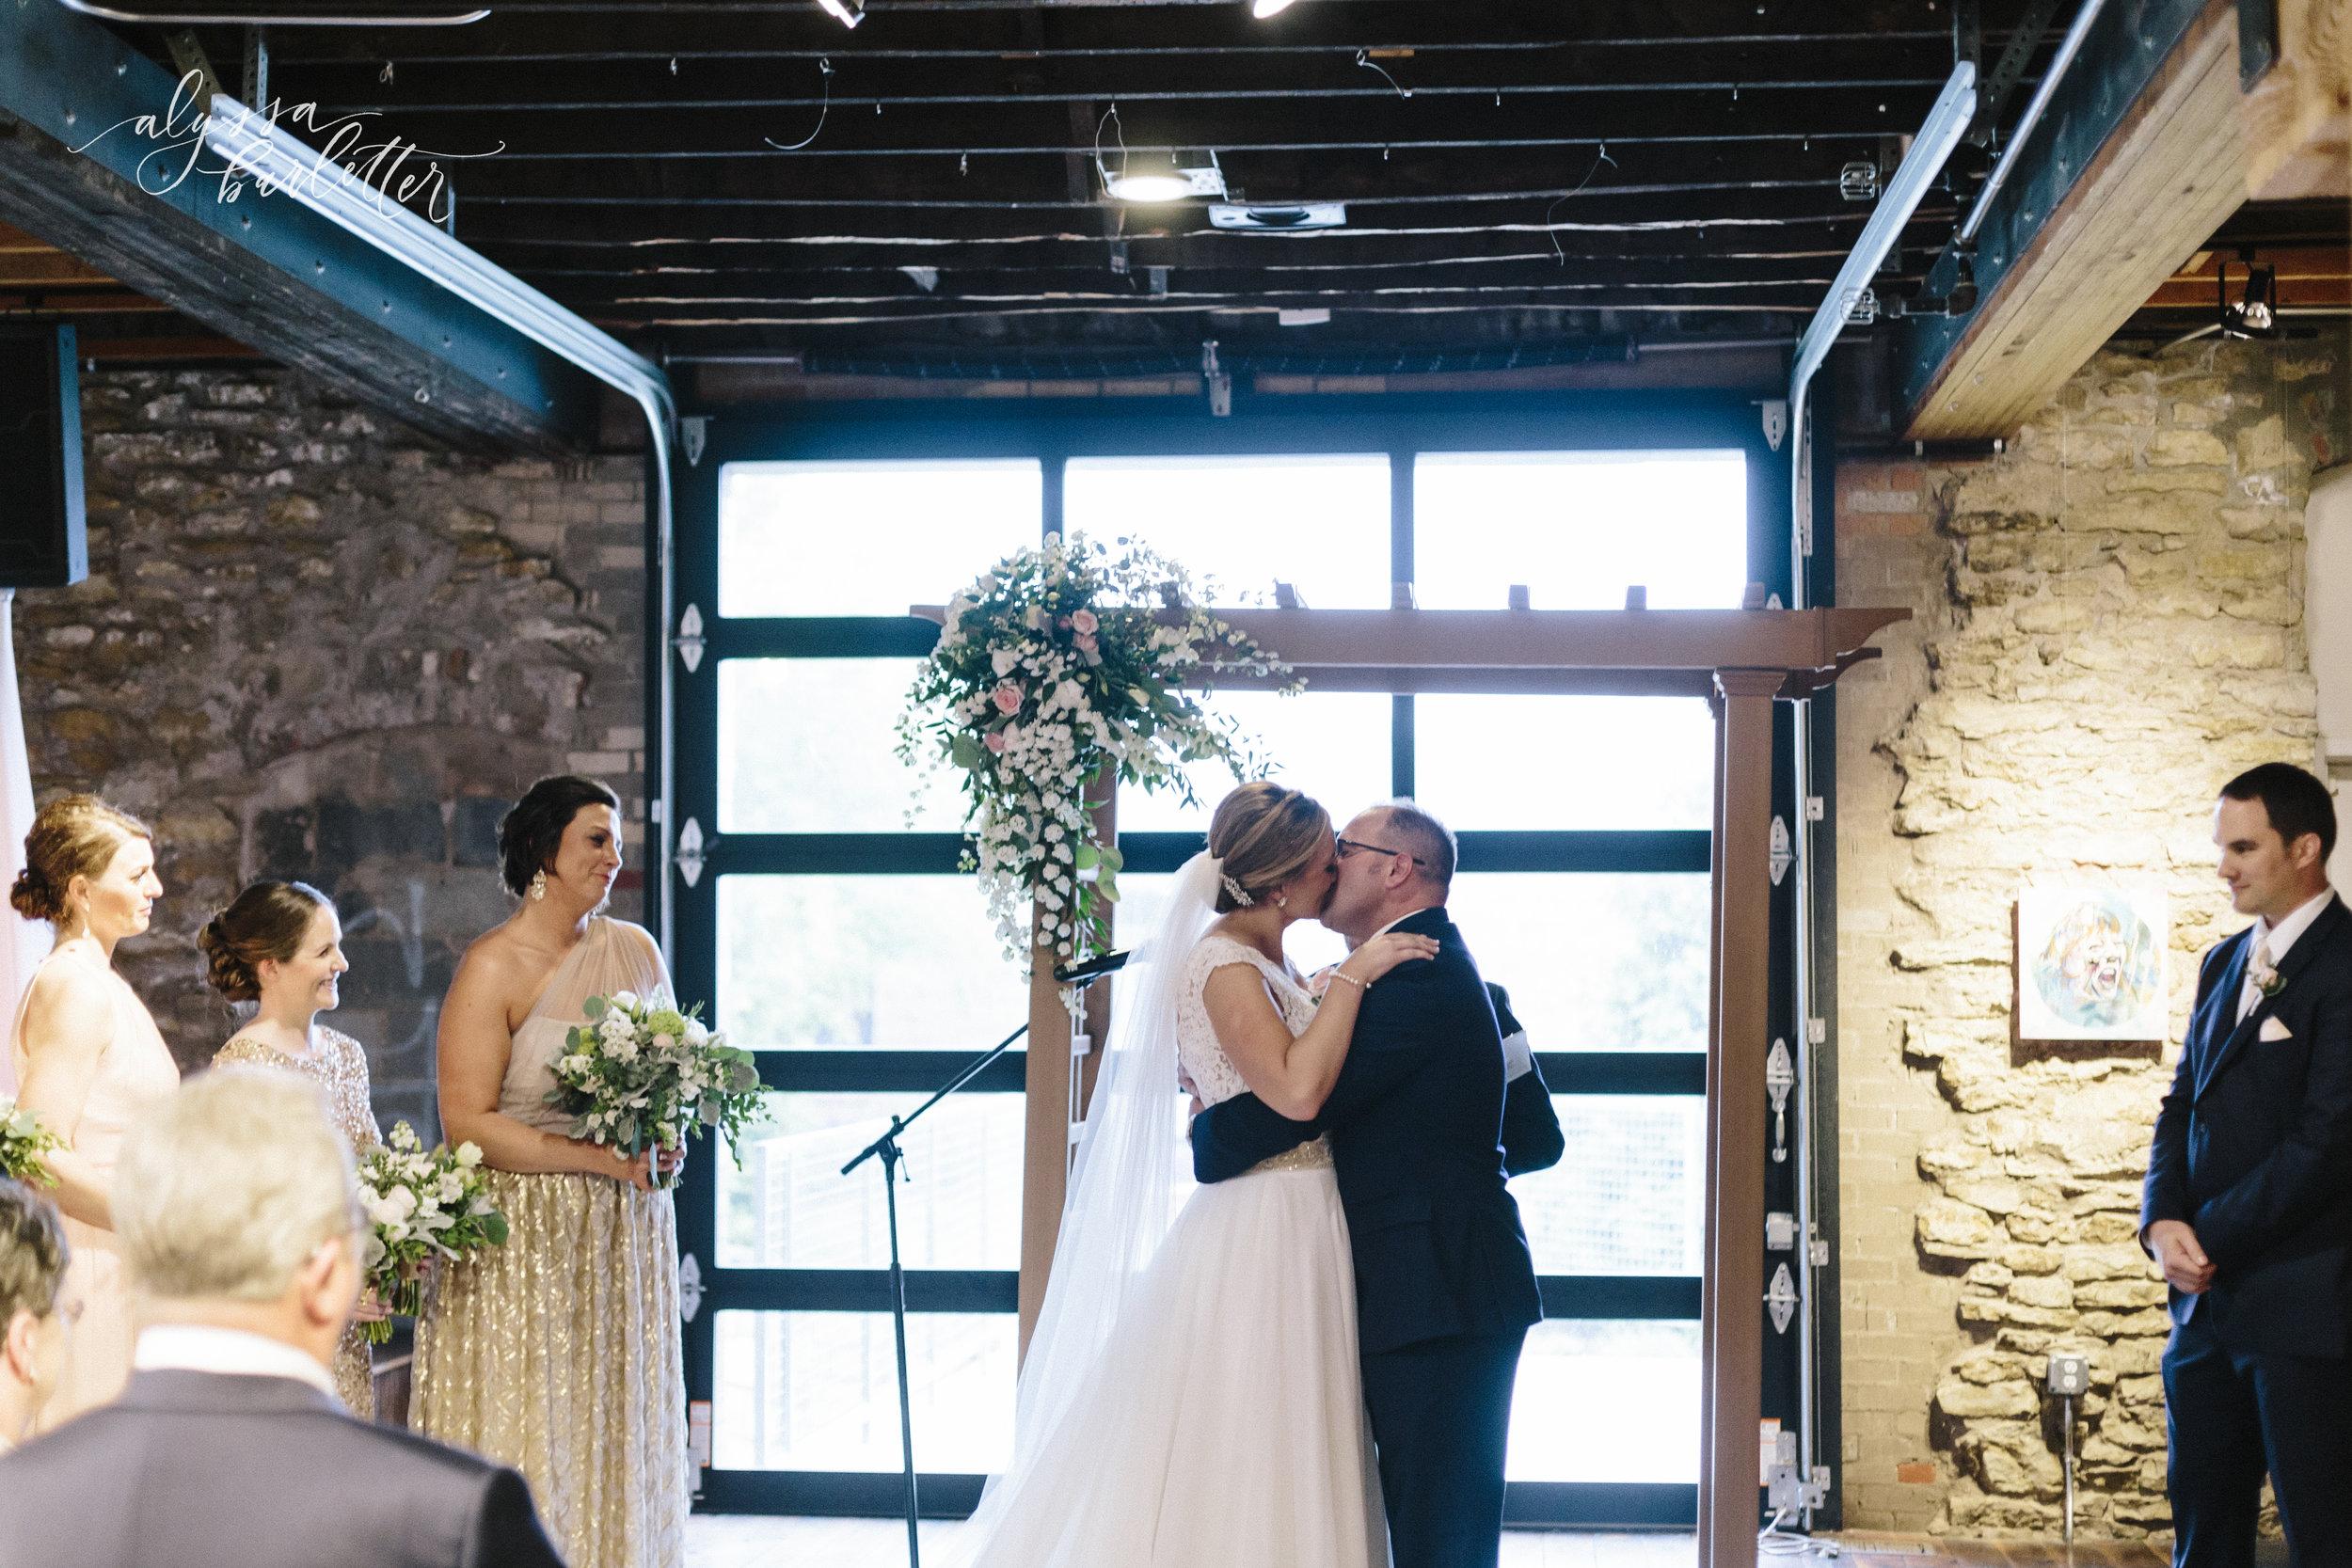 alyssa barletter photography cider gallery lawrence kansas rainy day wedding megan and brett-1-39.jpg